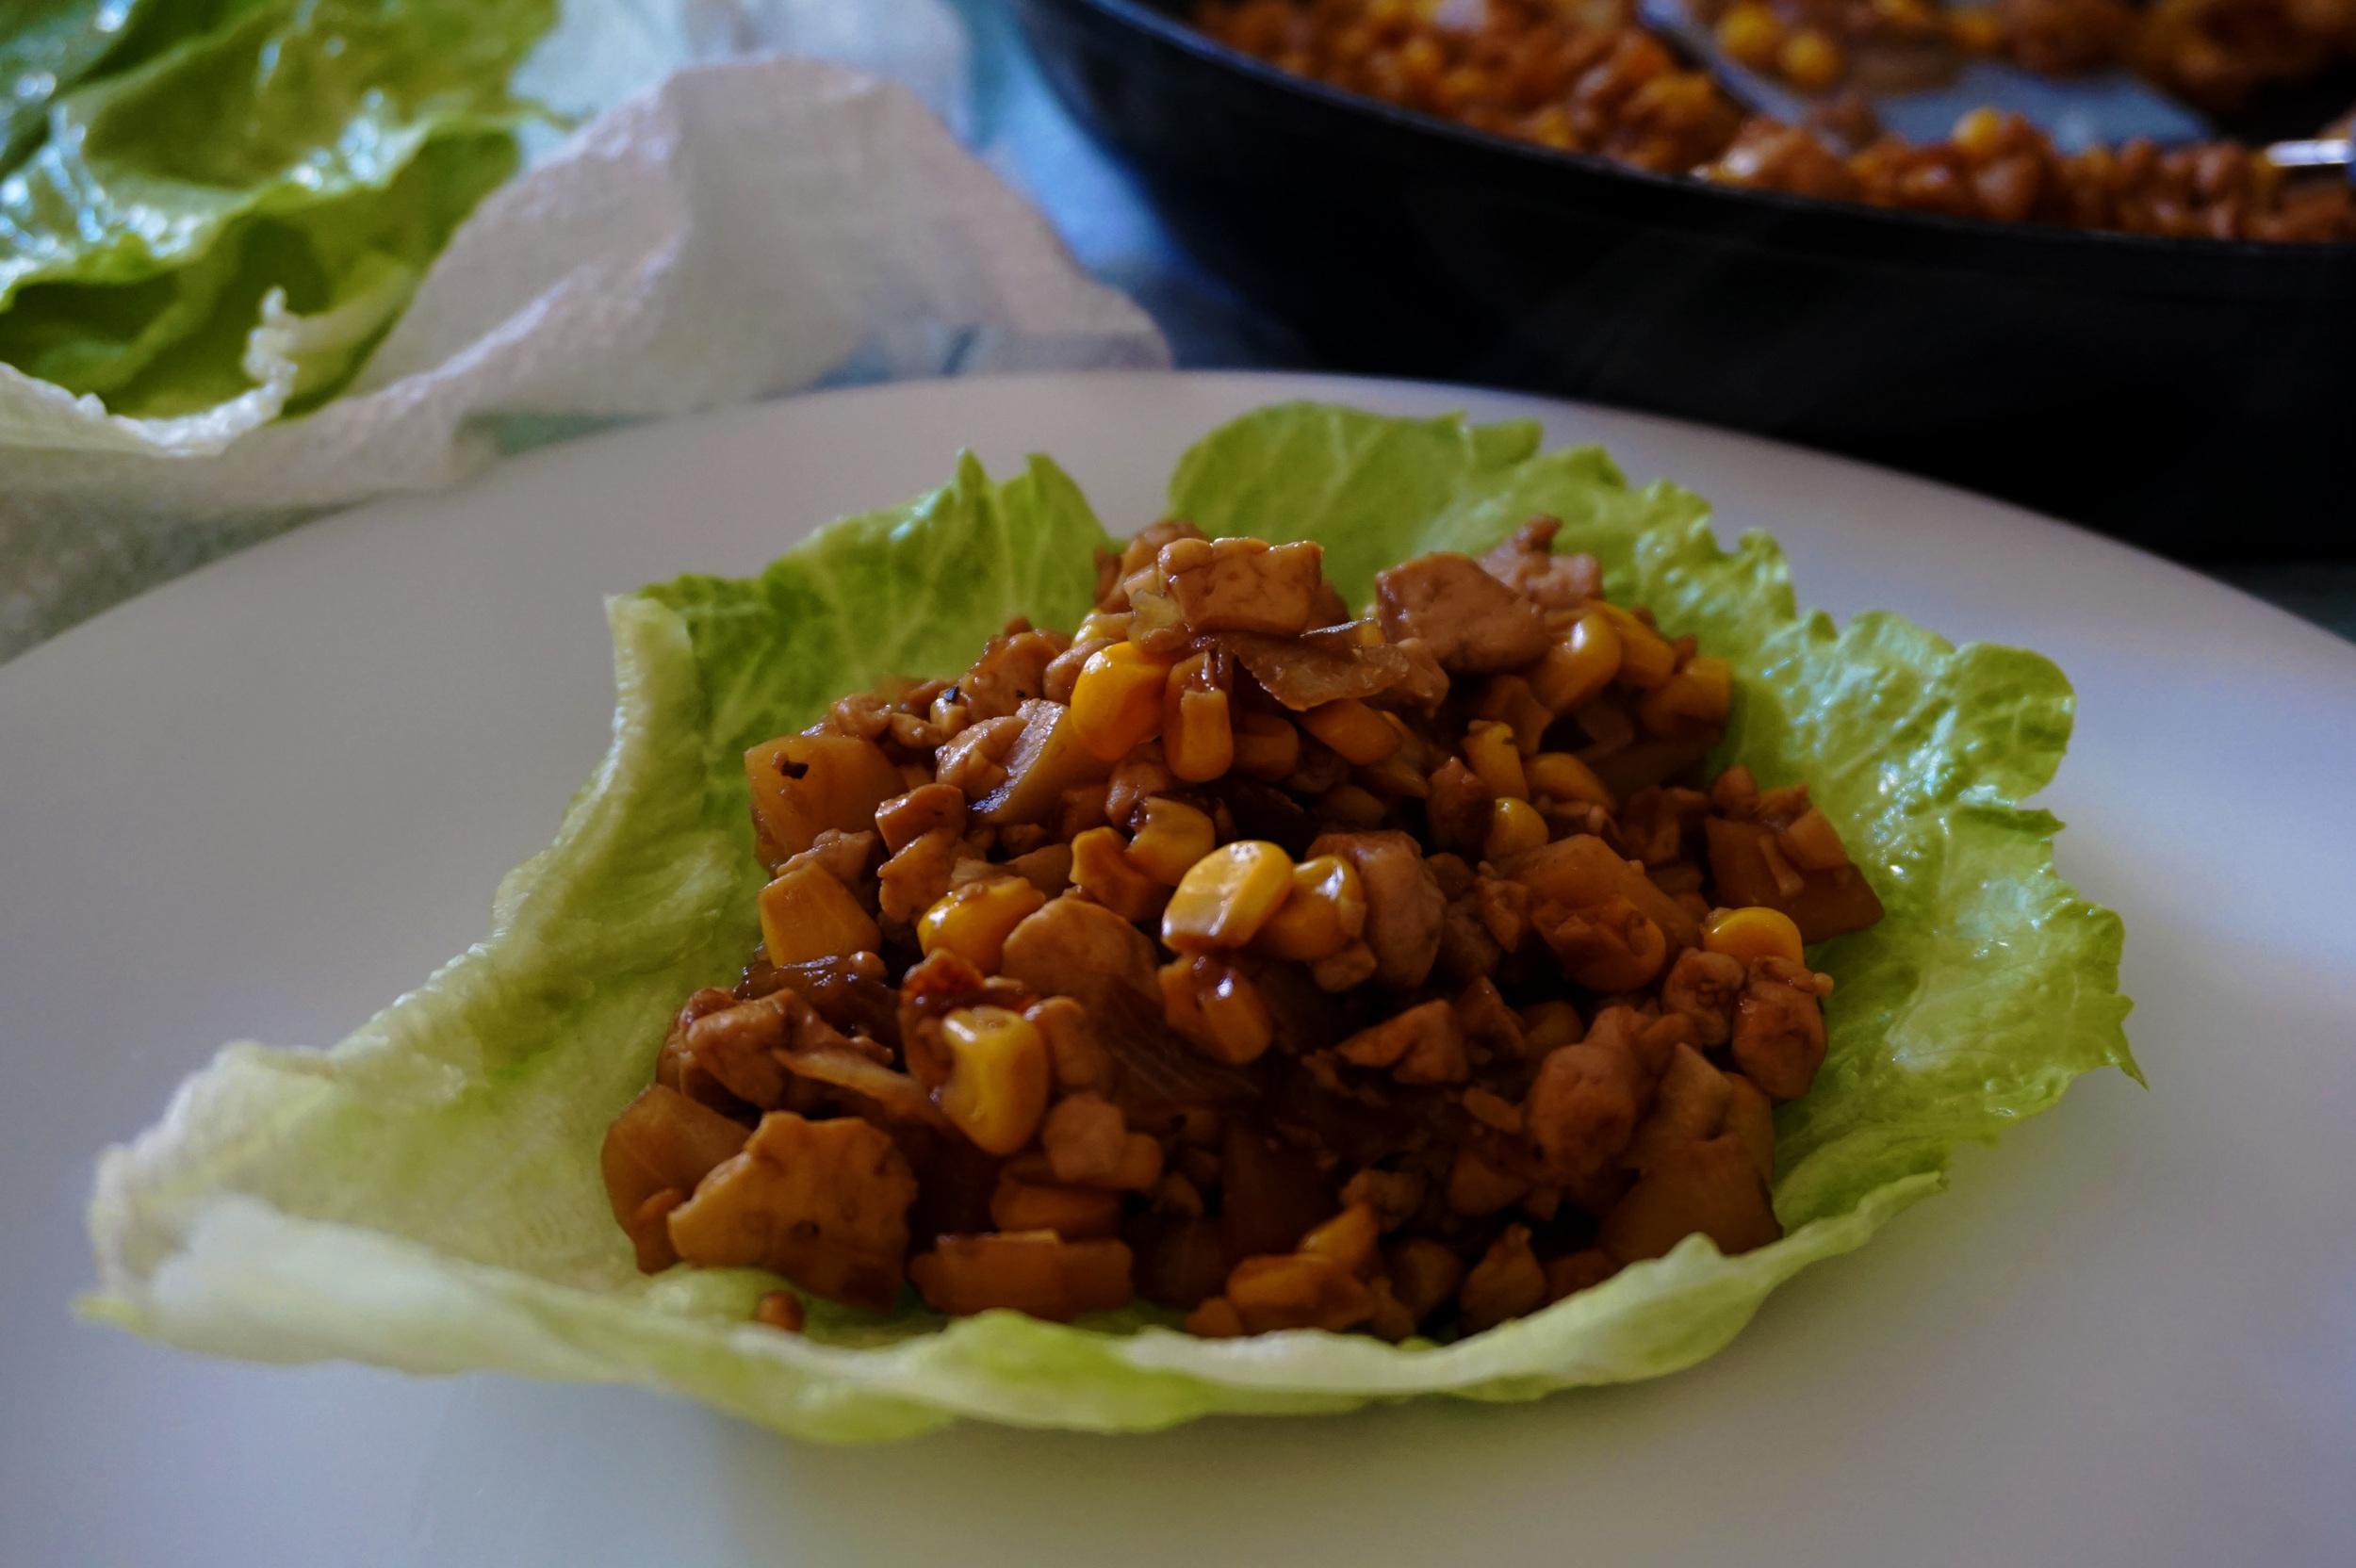 Vegetarian Asian-Style Lettuce Wraps